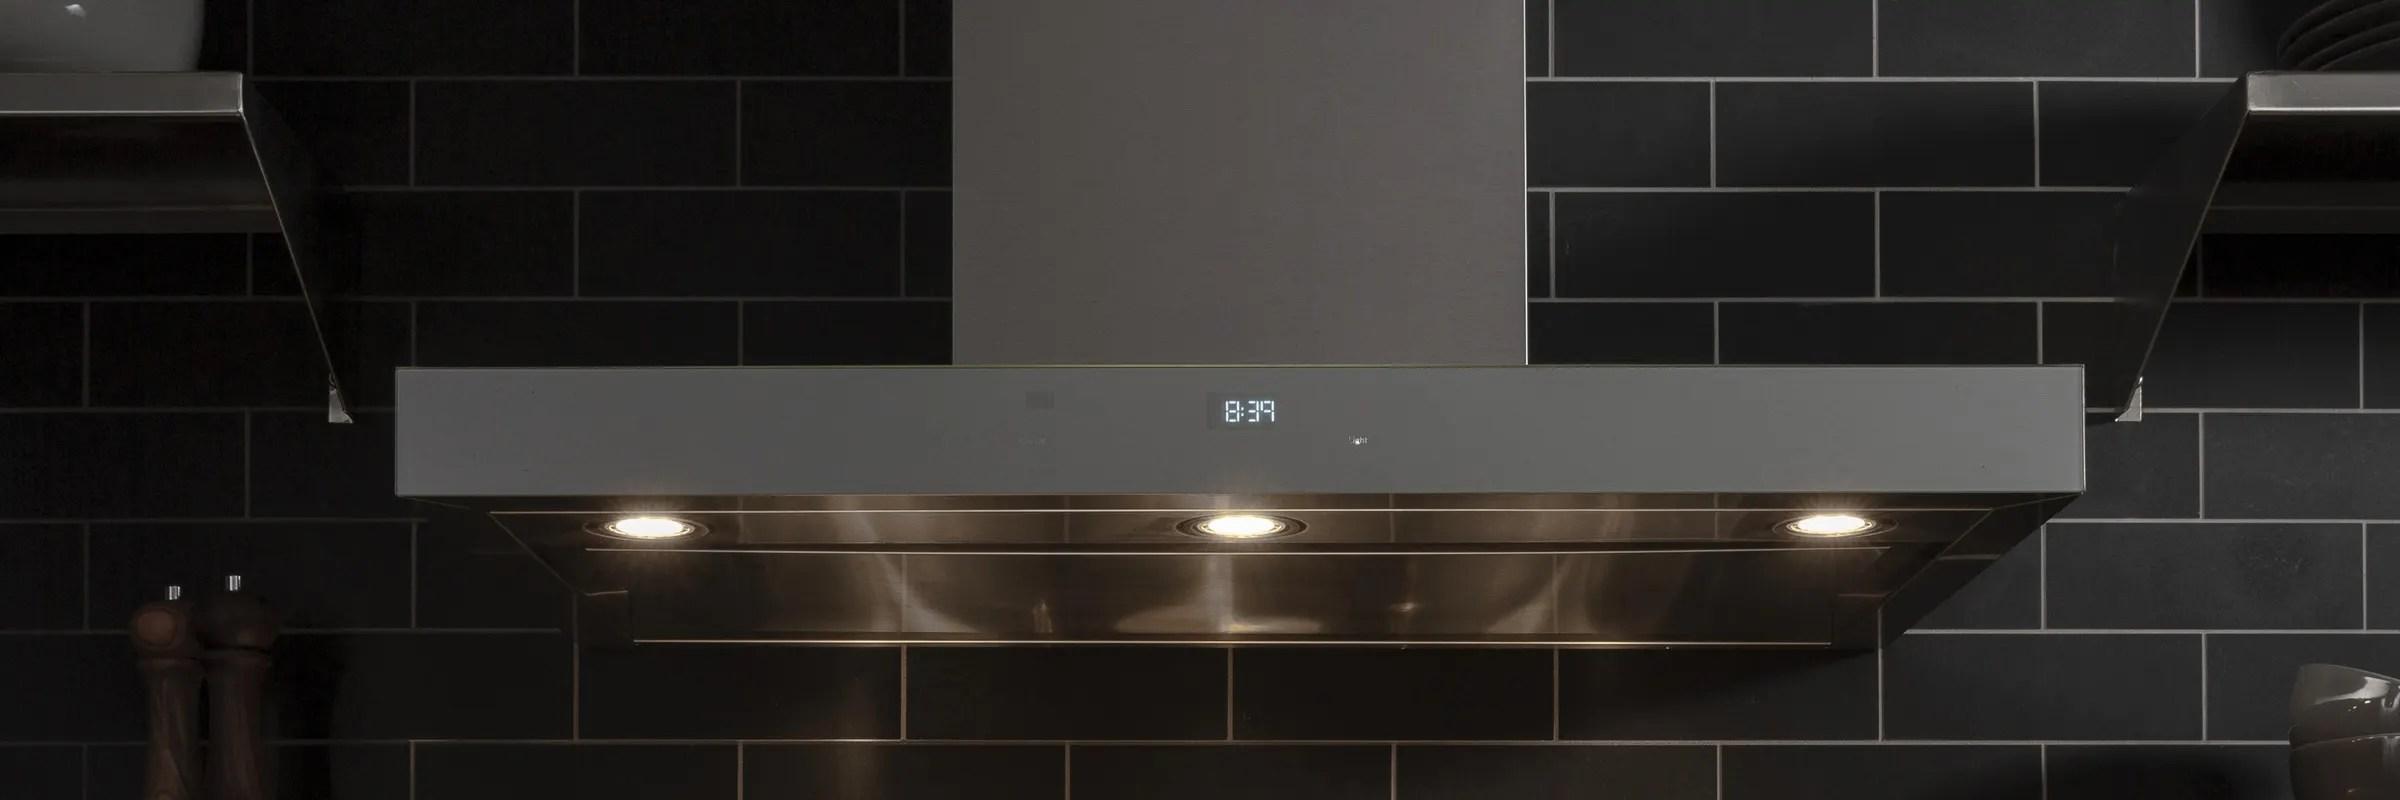 range hood kitchen vent hood chimney